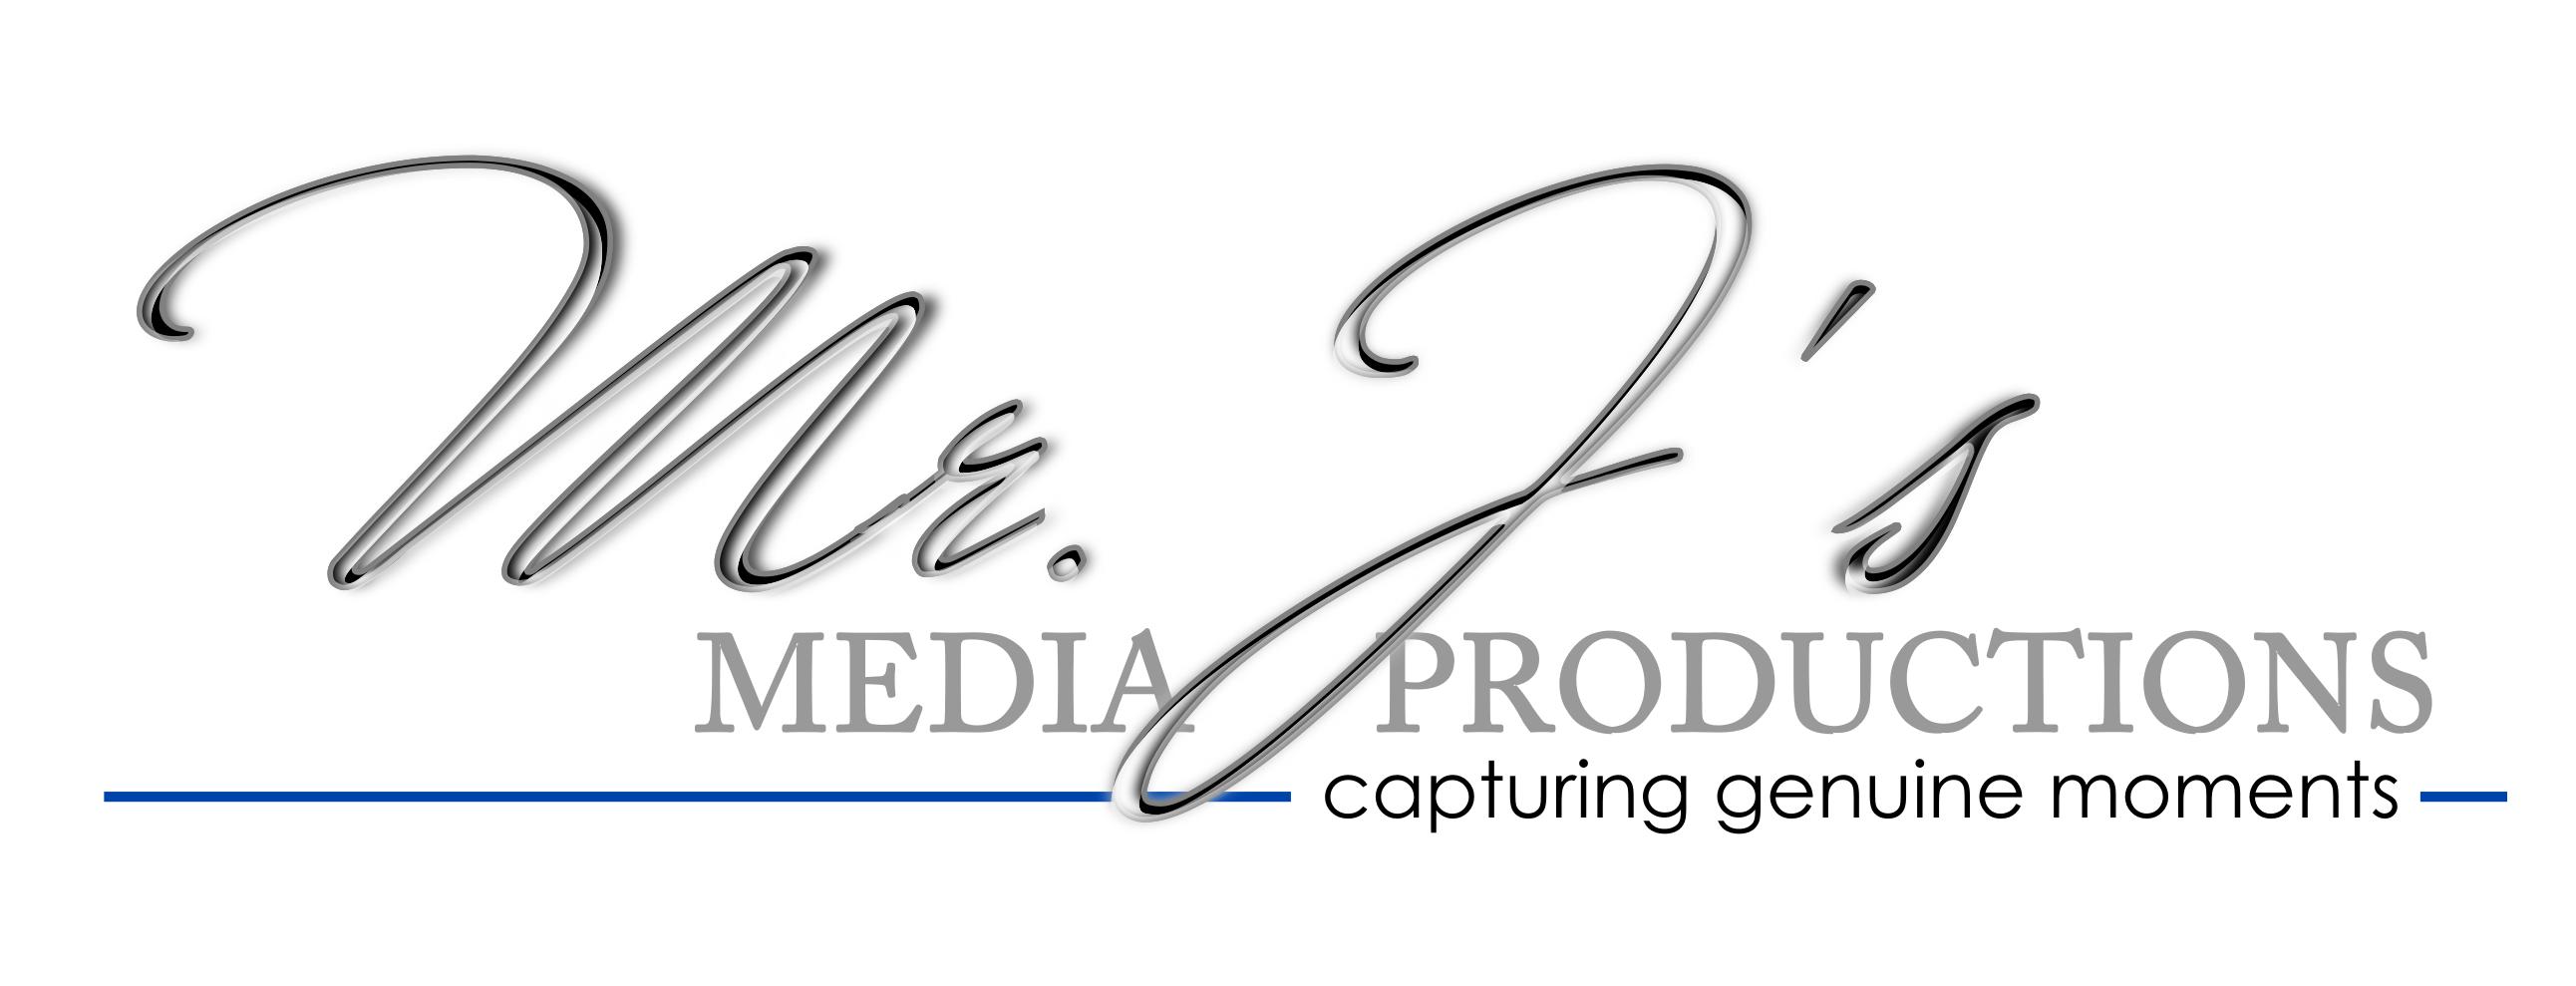 Mr. J's Media Productions